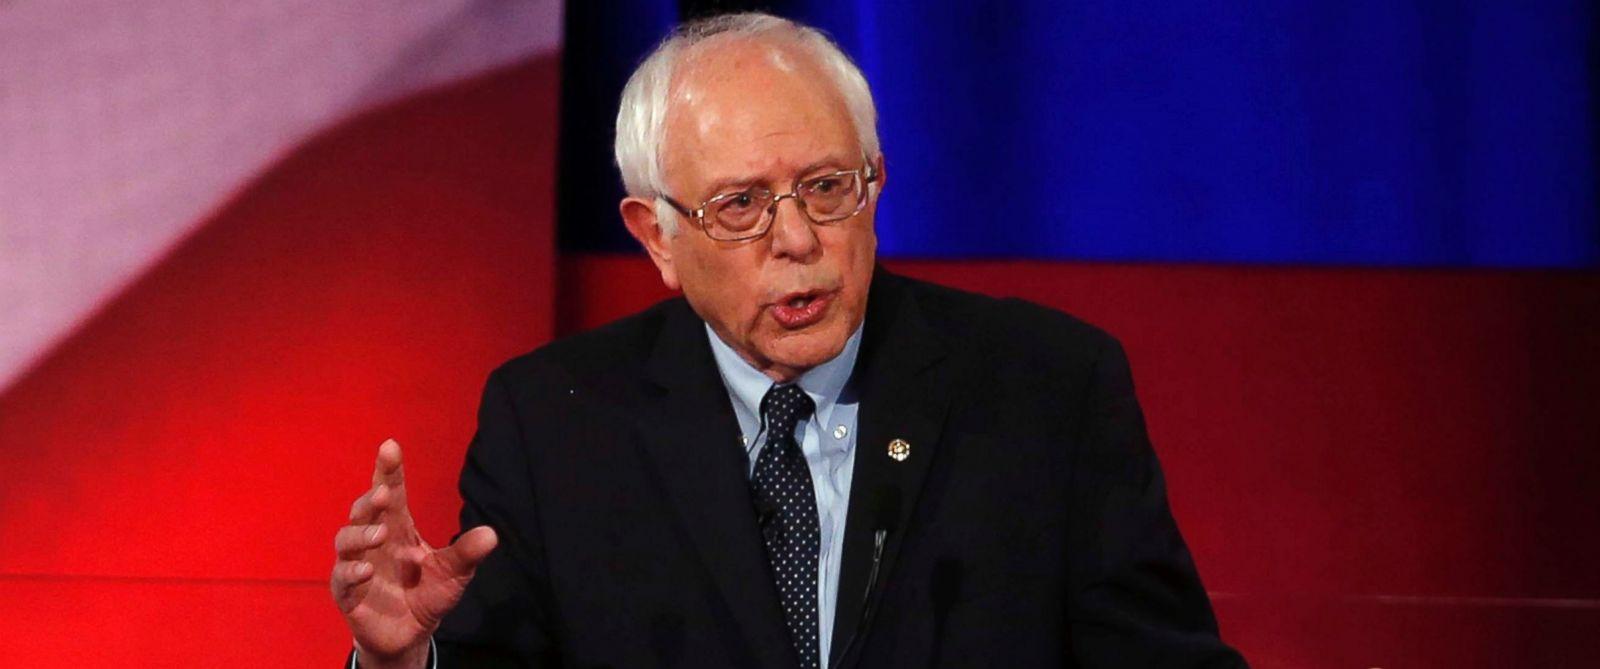 PHOTO: Democratic presidential candidate, Sen. Bernie Sanders, speaks at the NBC, YouTube Democratic presidential debate at the Gaillard Center on Jan. 17, 2016, in Charleston, S.C.